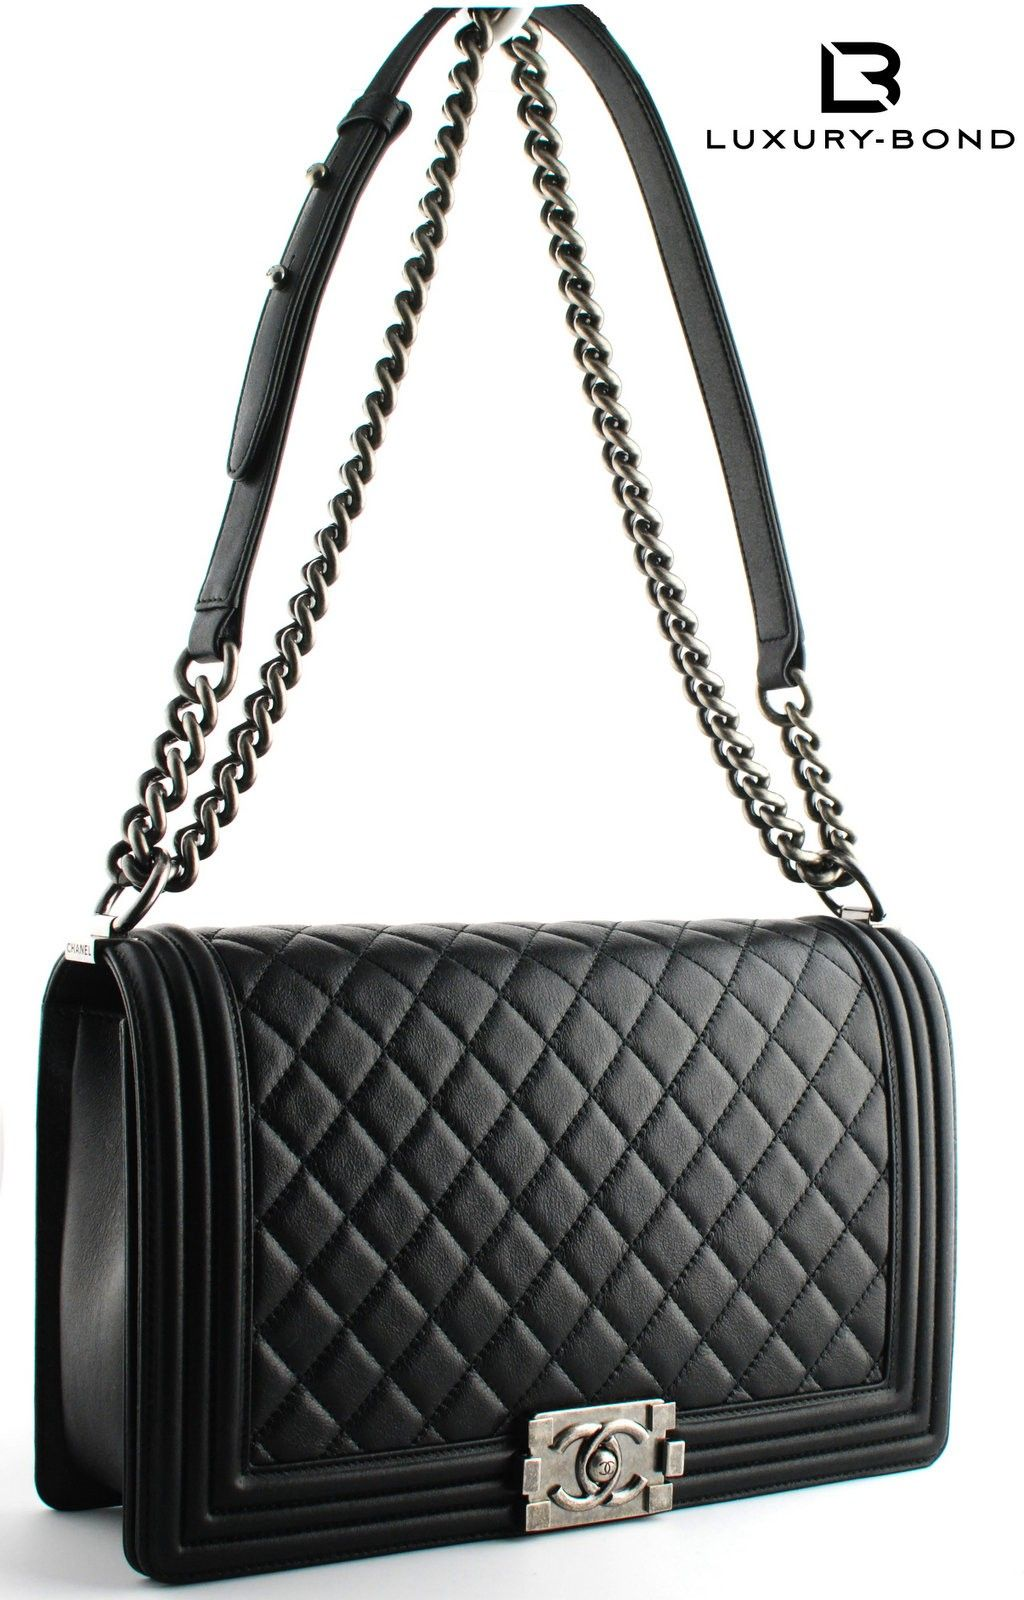 cf47ea375bfa66 Chanel Black Boy Bag Chanel Le Boy New Medium Size Black Metallic Calf Flap  Bag